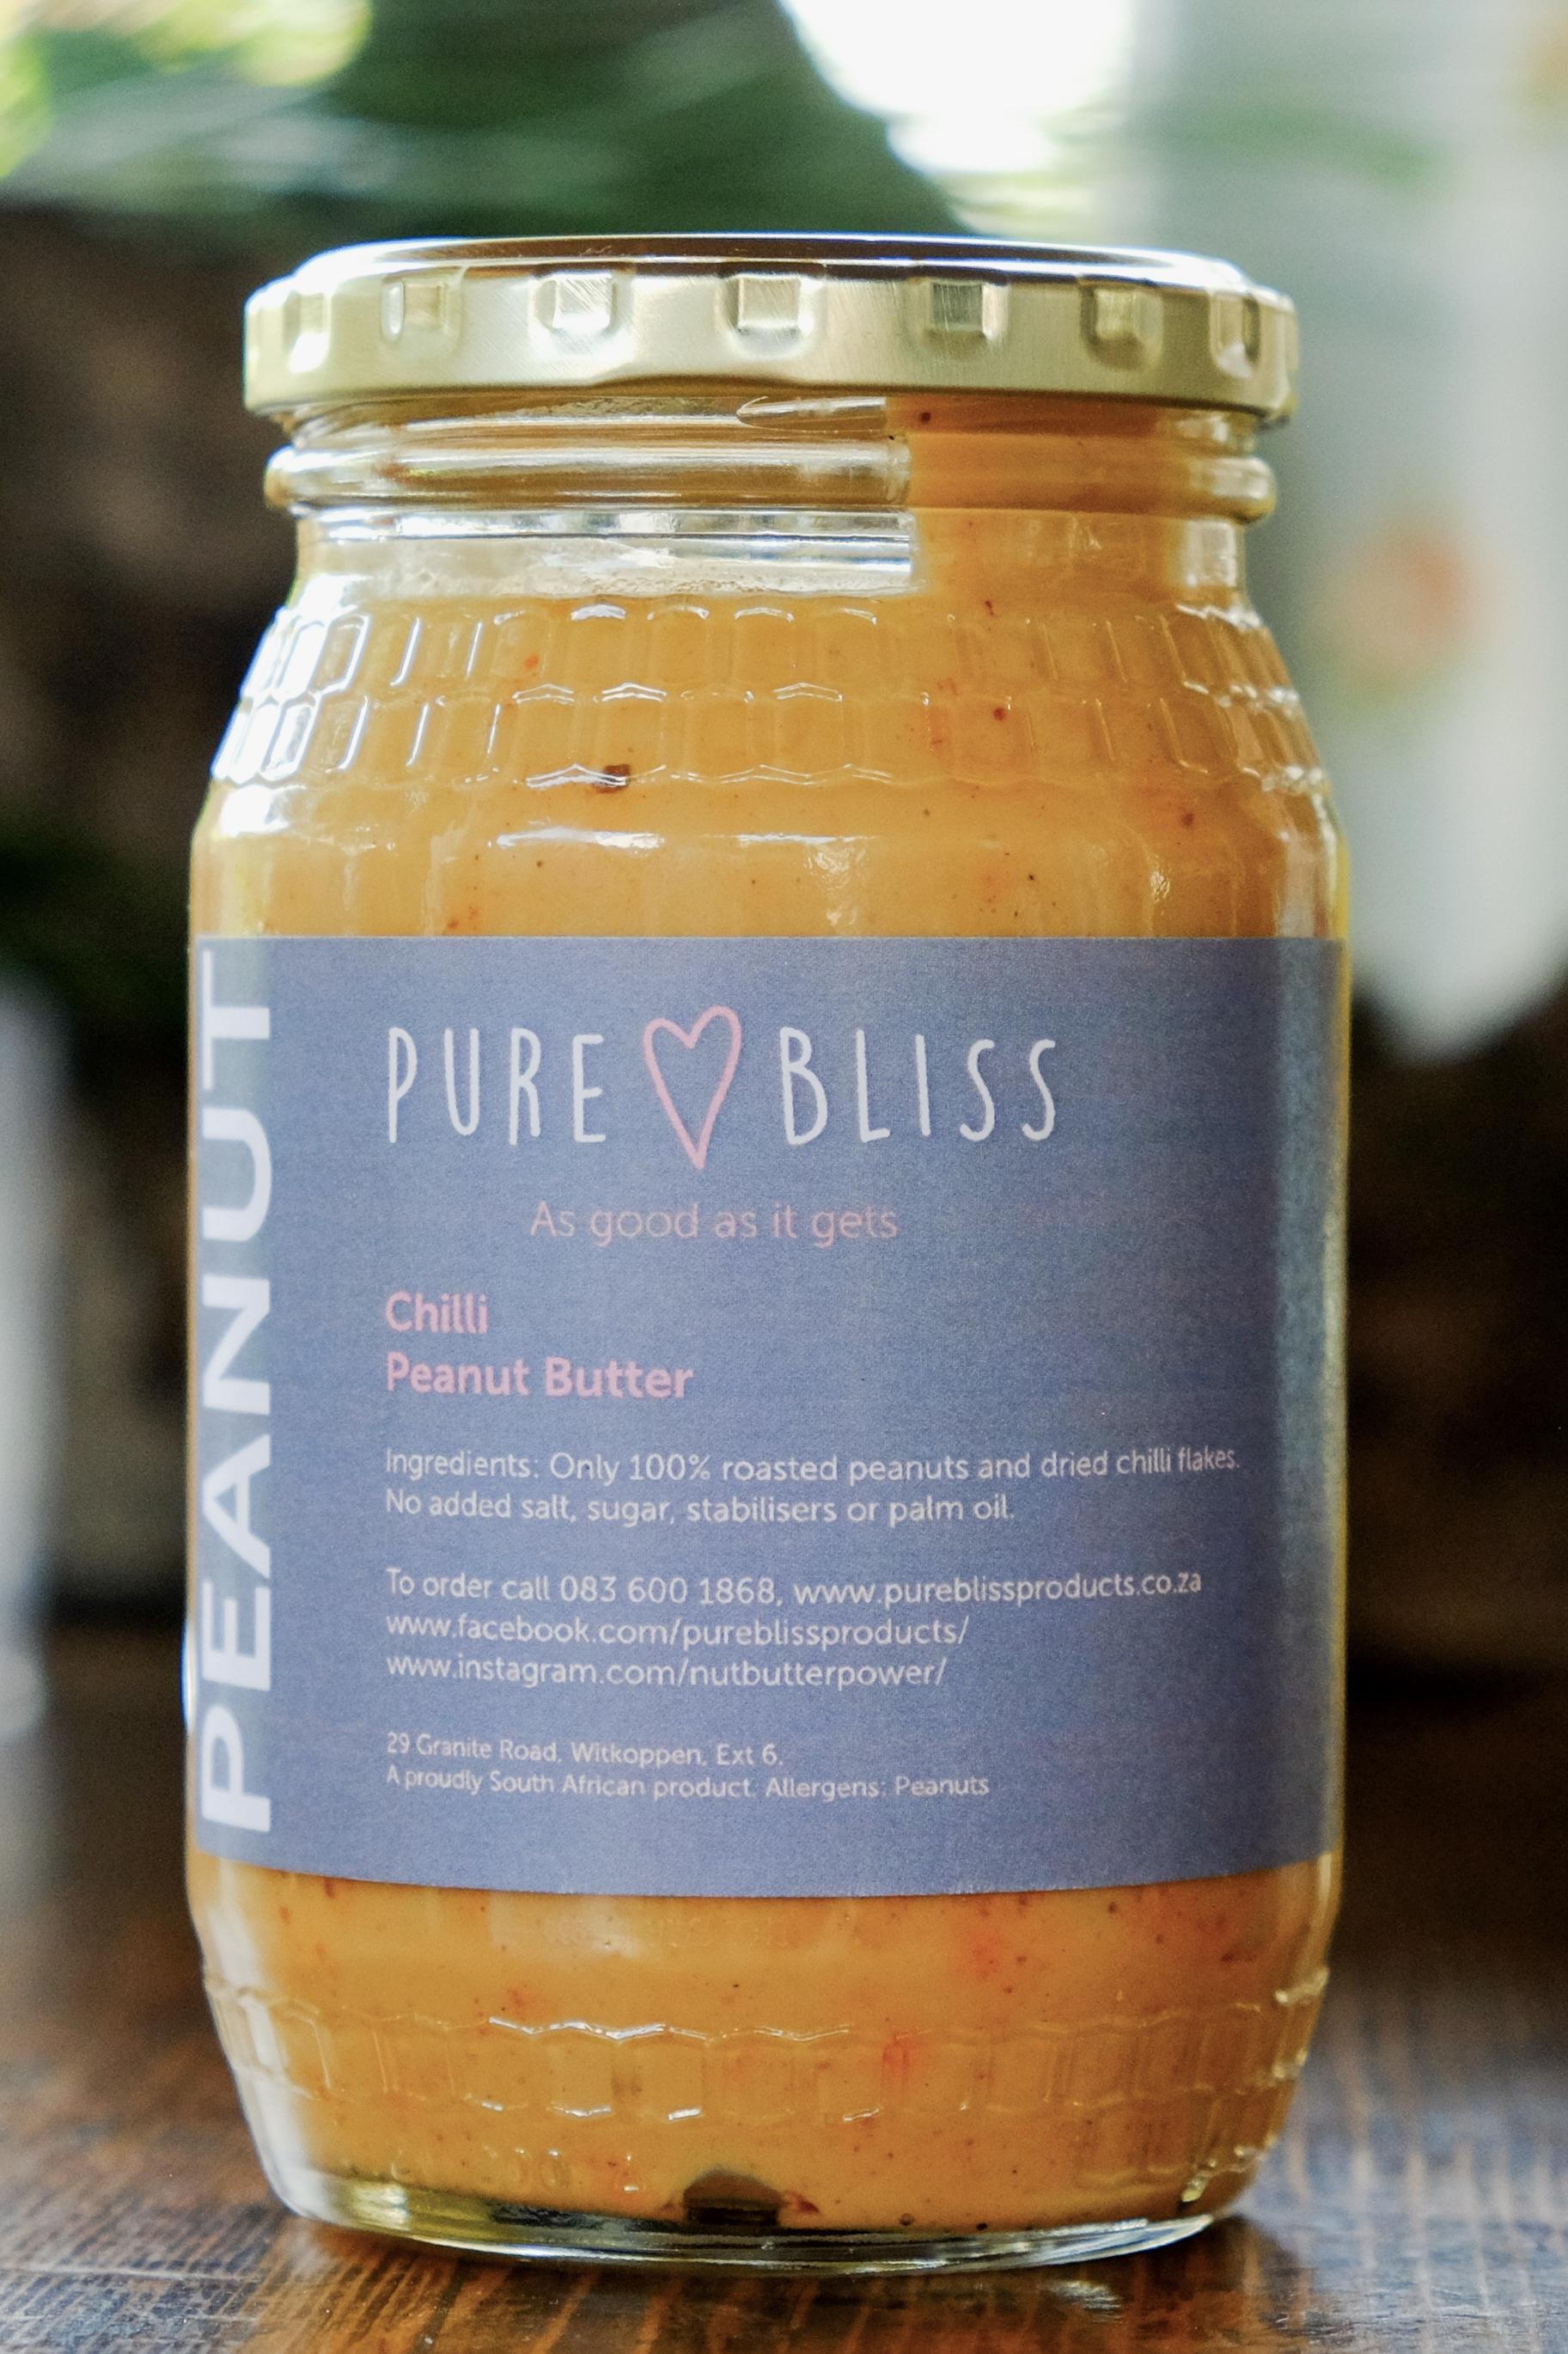 Chilli Peanut Butter (350g)